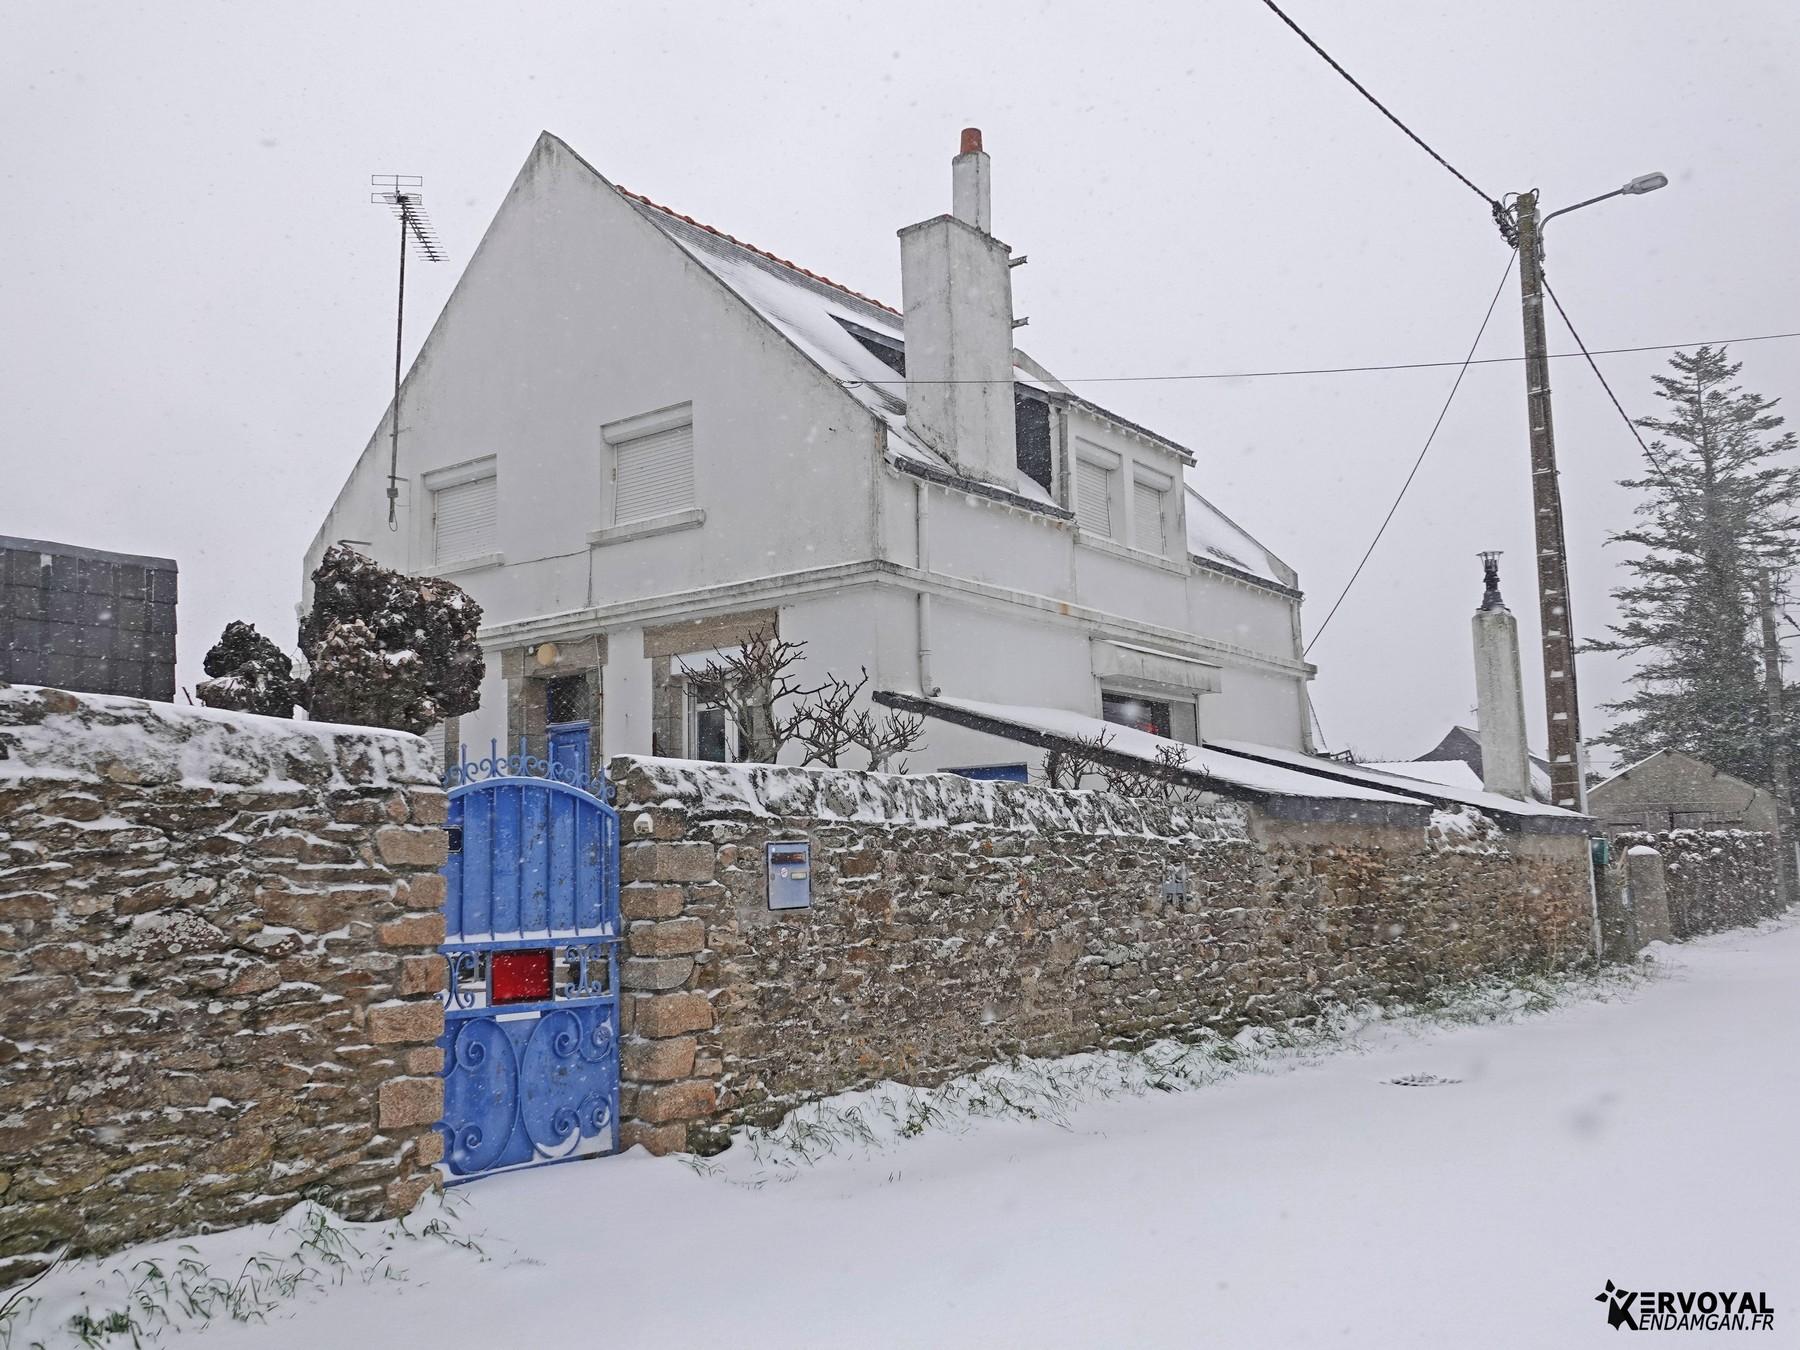 neige à kervoyal 11 février 2021 damgan morbihan (35)